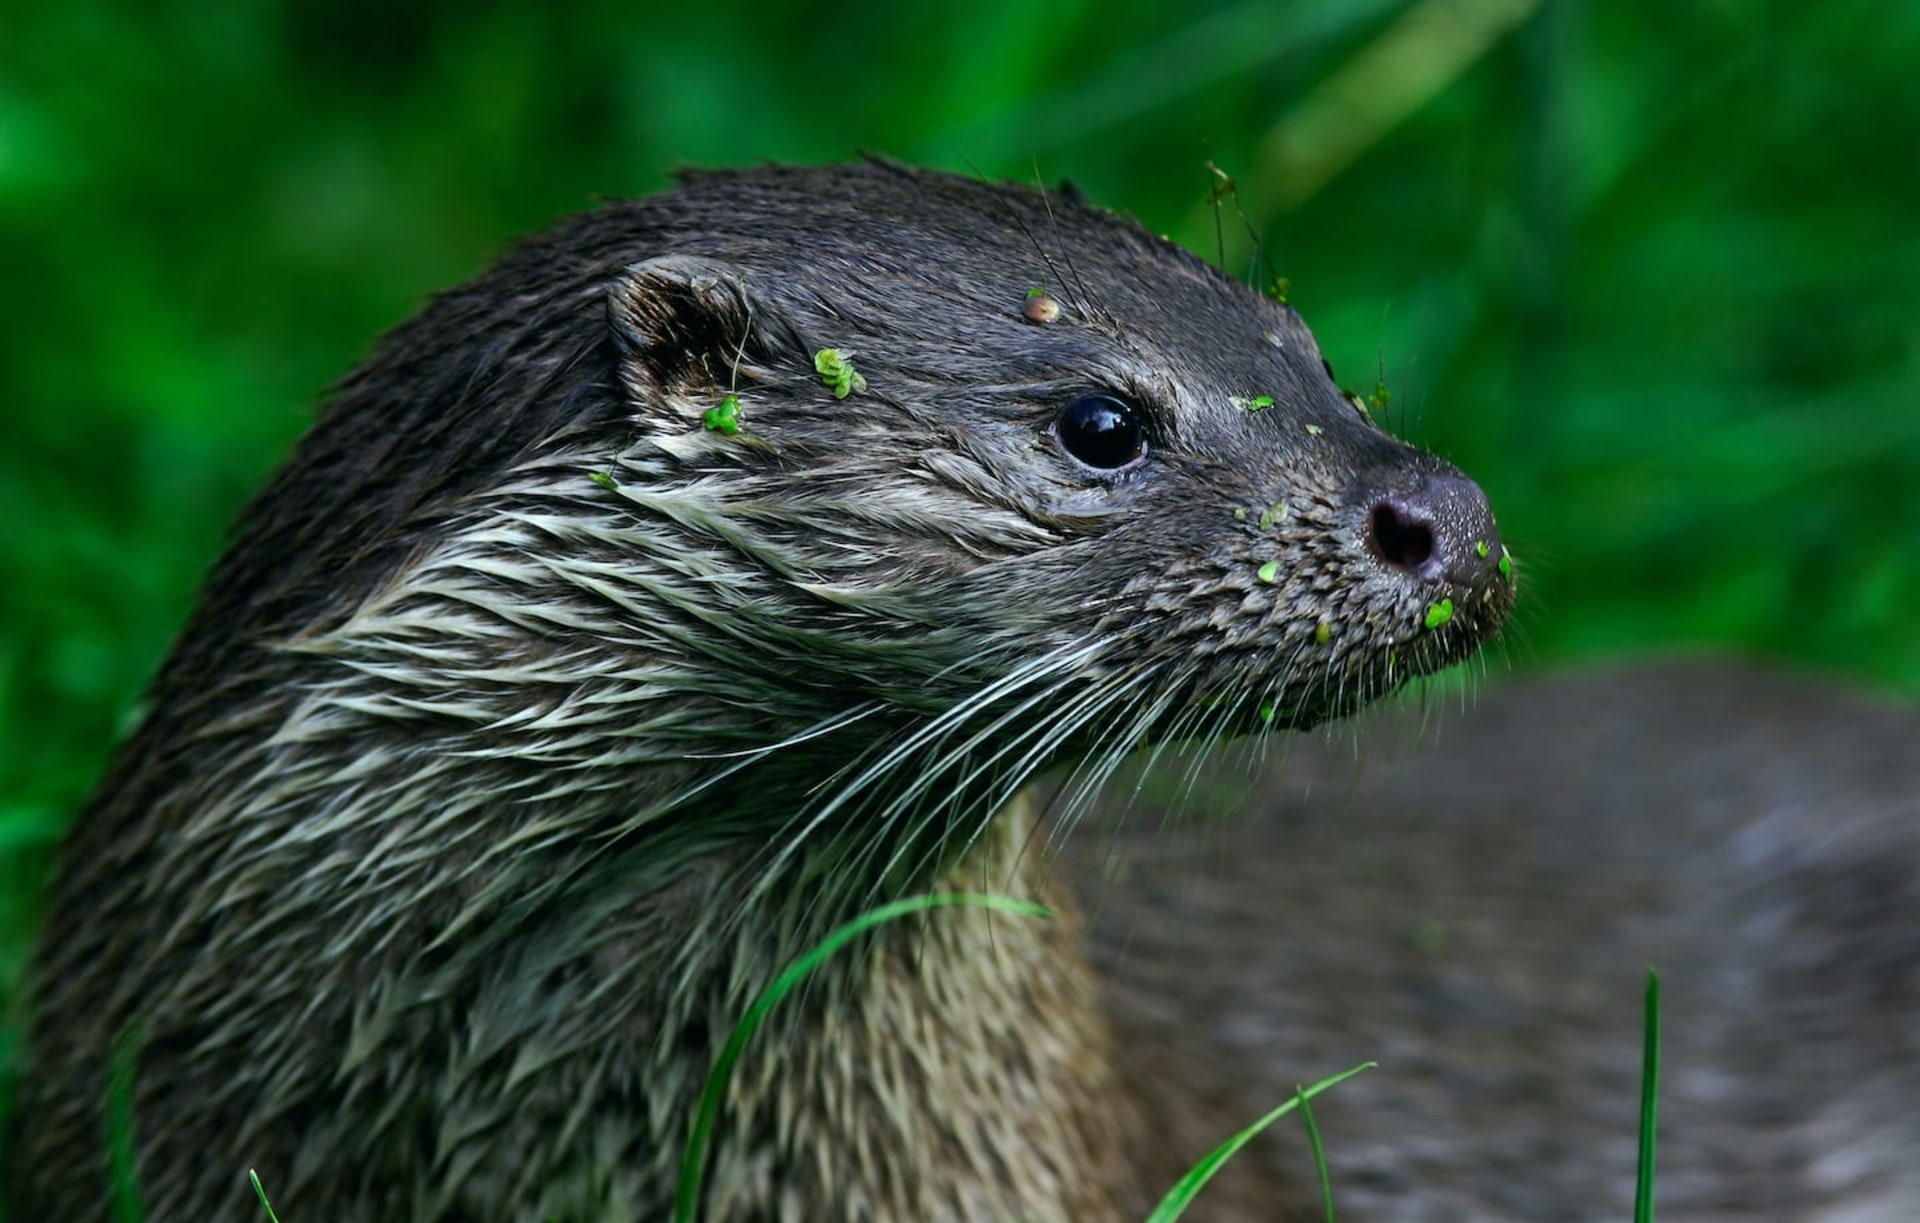 A Hidden Life: The Mystery of the Eurasian Otter